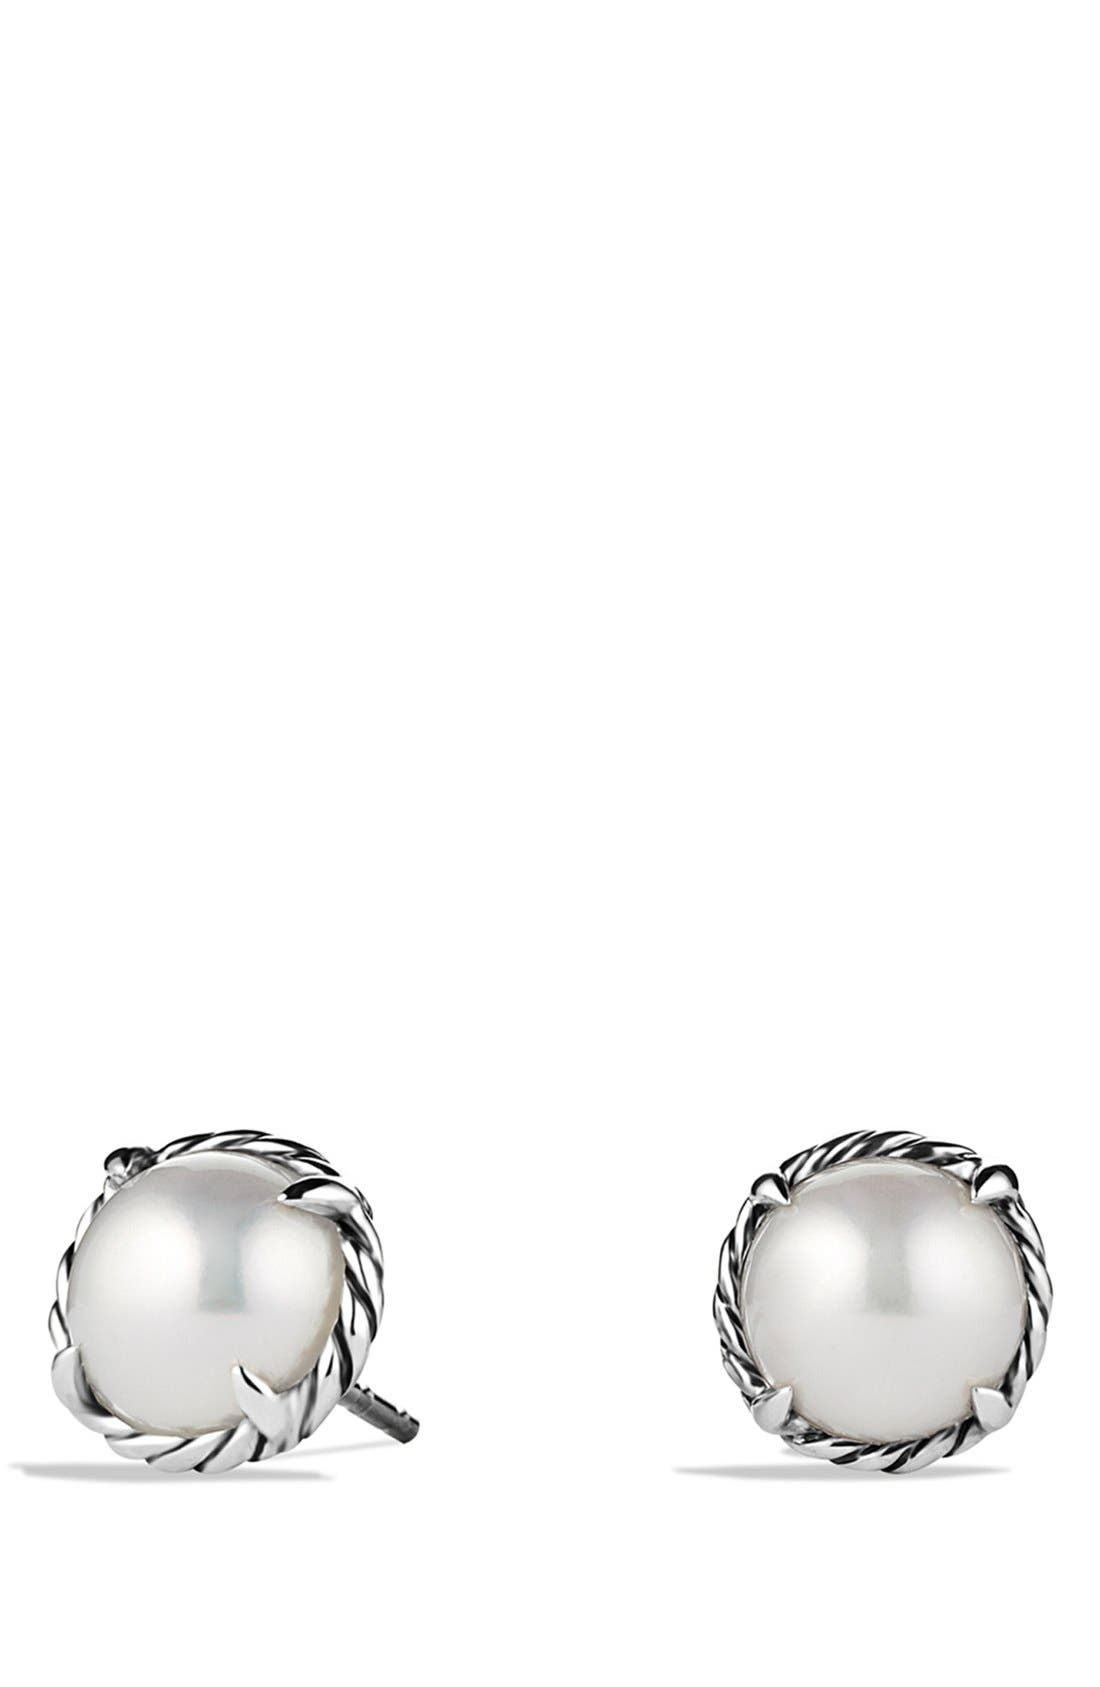 Main Image - David Yurman 'Châtelaine' Earrings